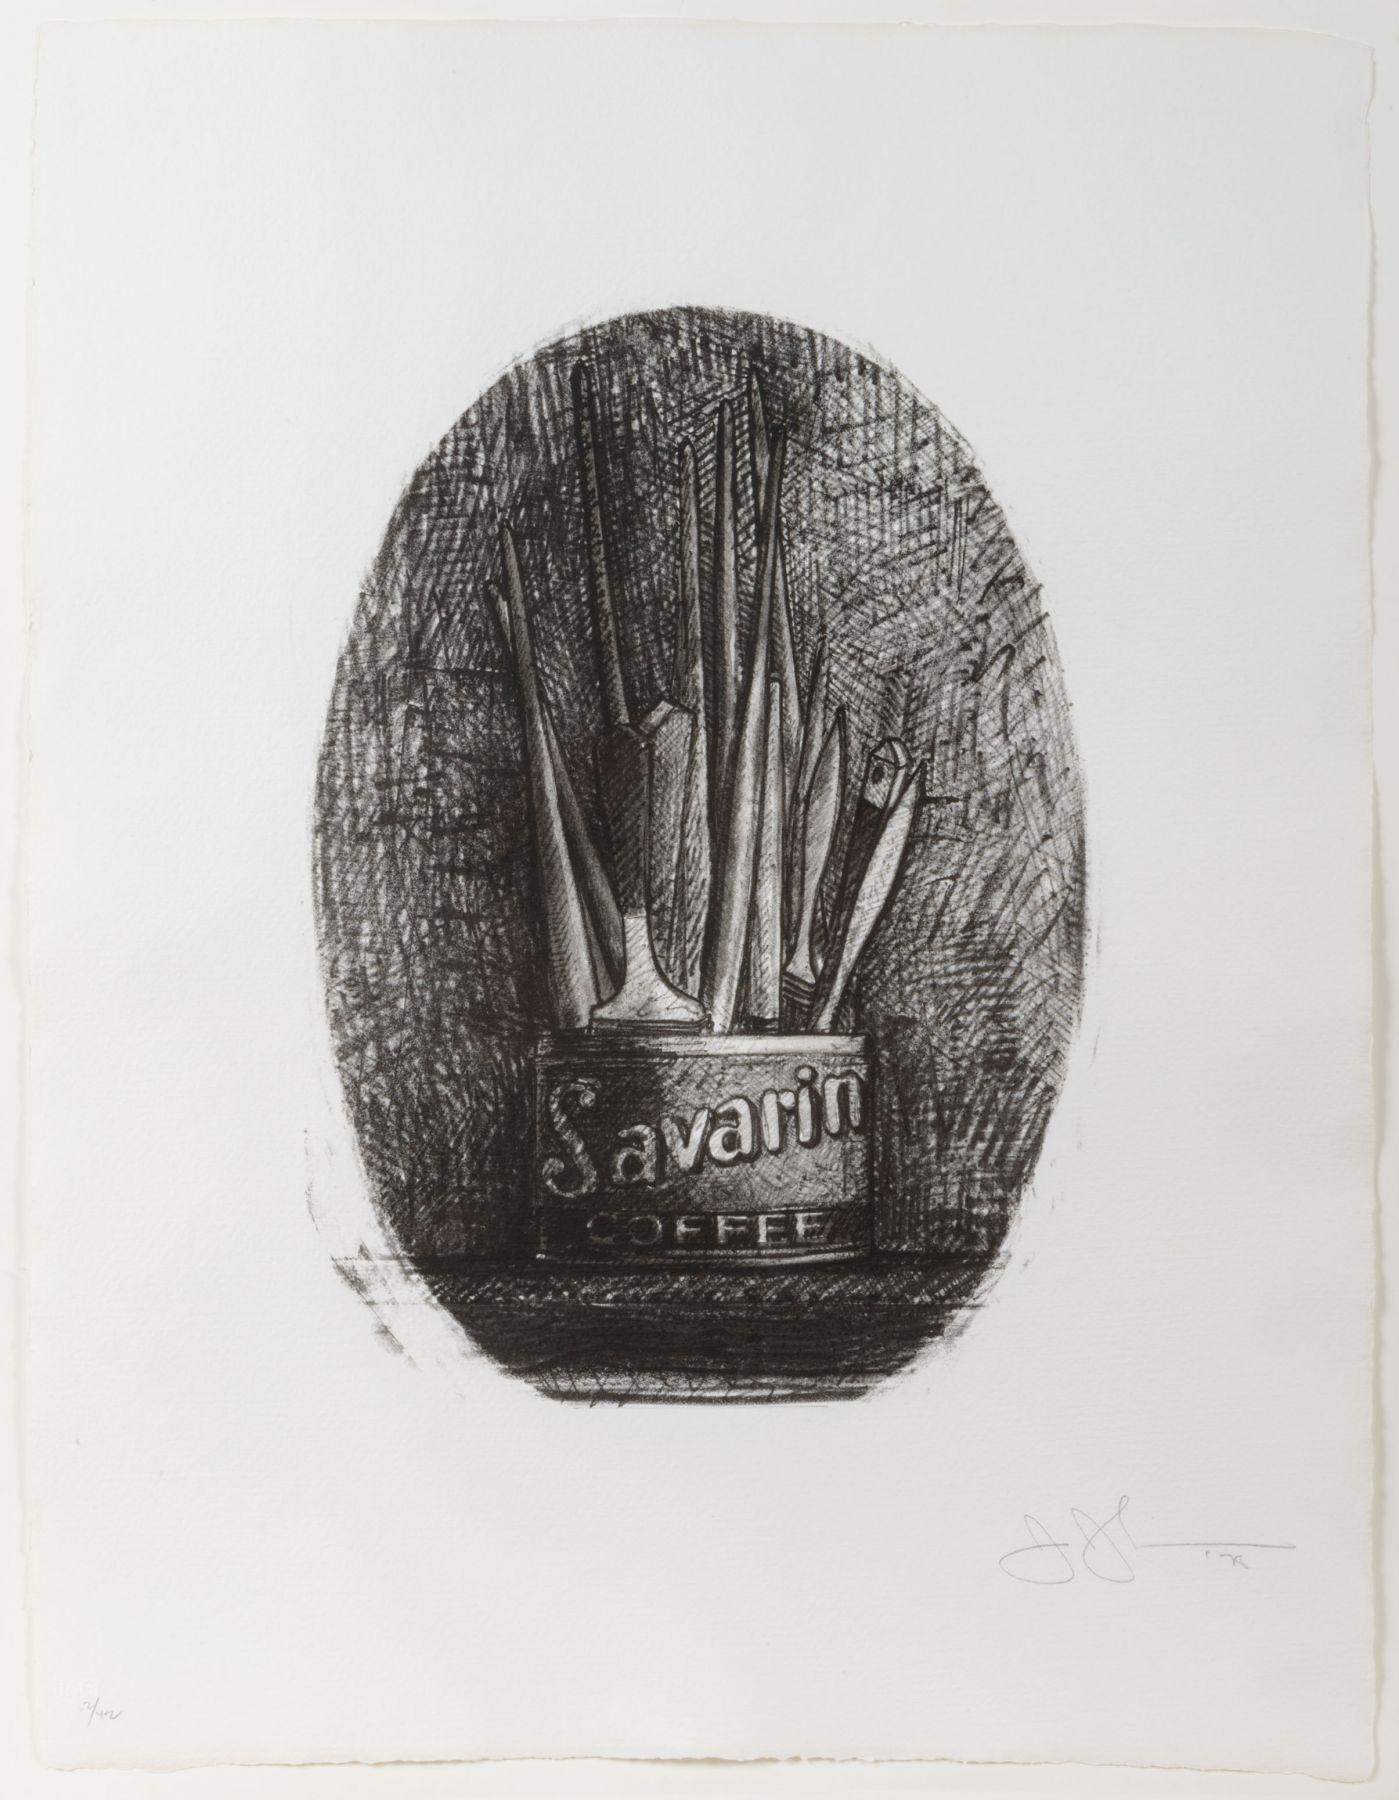 Savarin 4 (Oval) by Jasper Johns